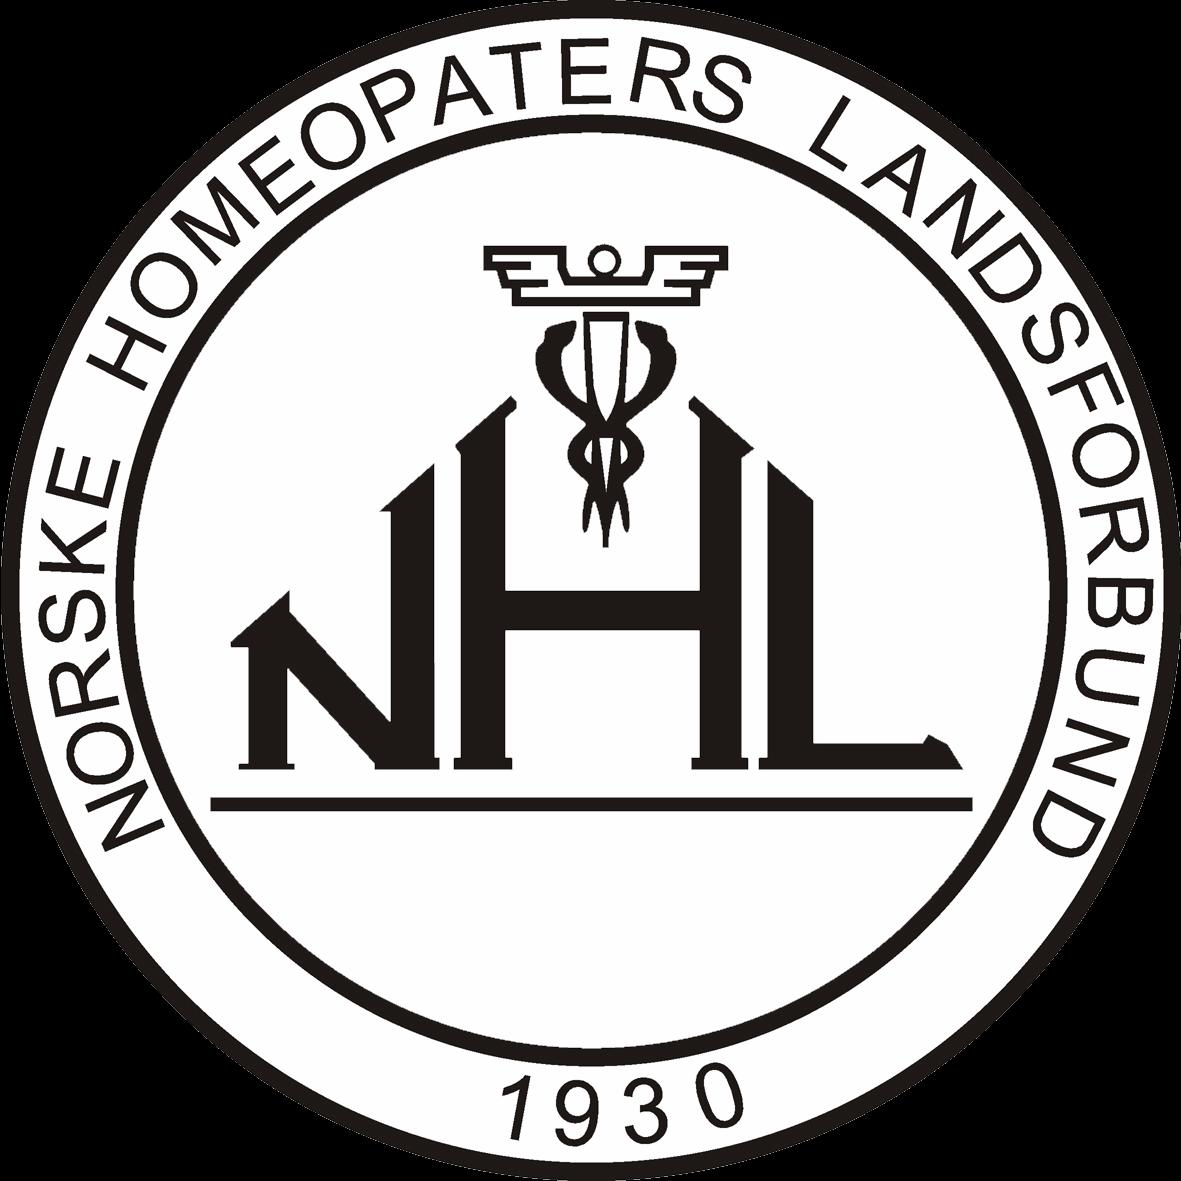 Norske Homeopaters Landsforbund